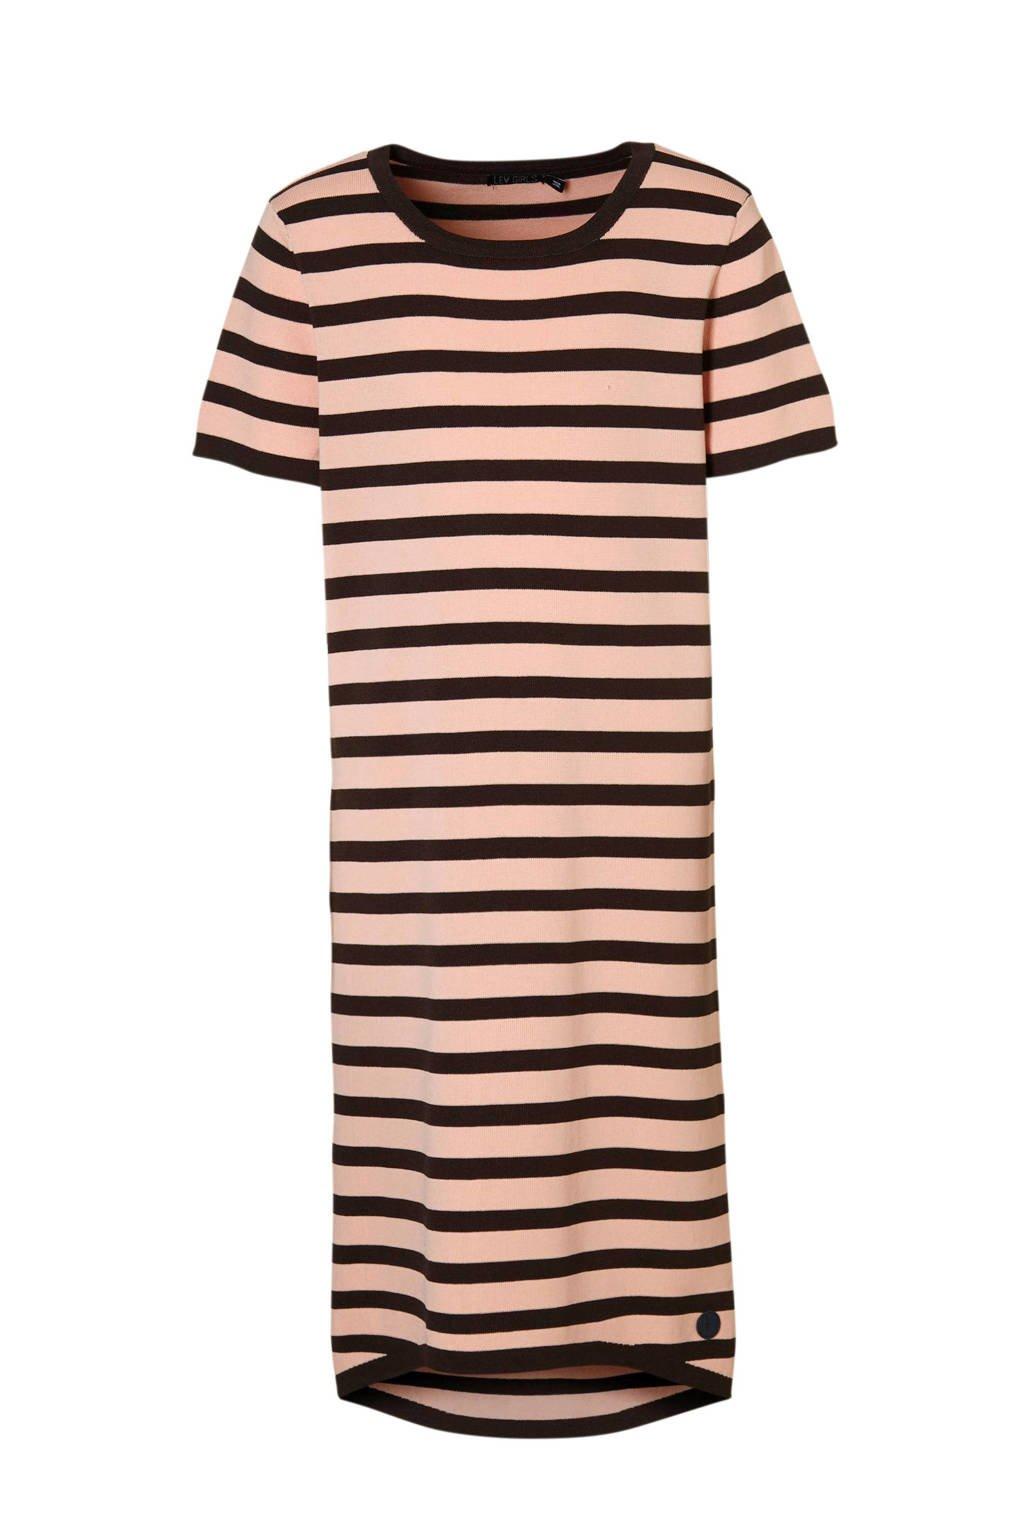 LEVV gestreepte jurk Berta oudroze, Oudroze/bruin